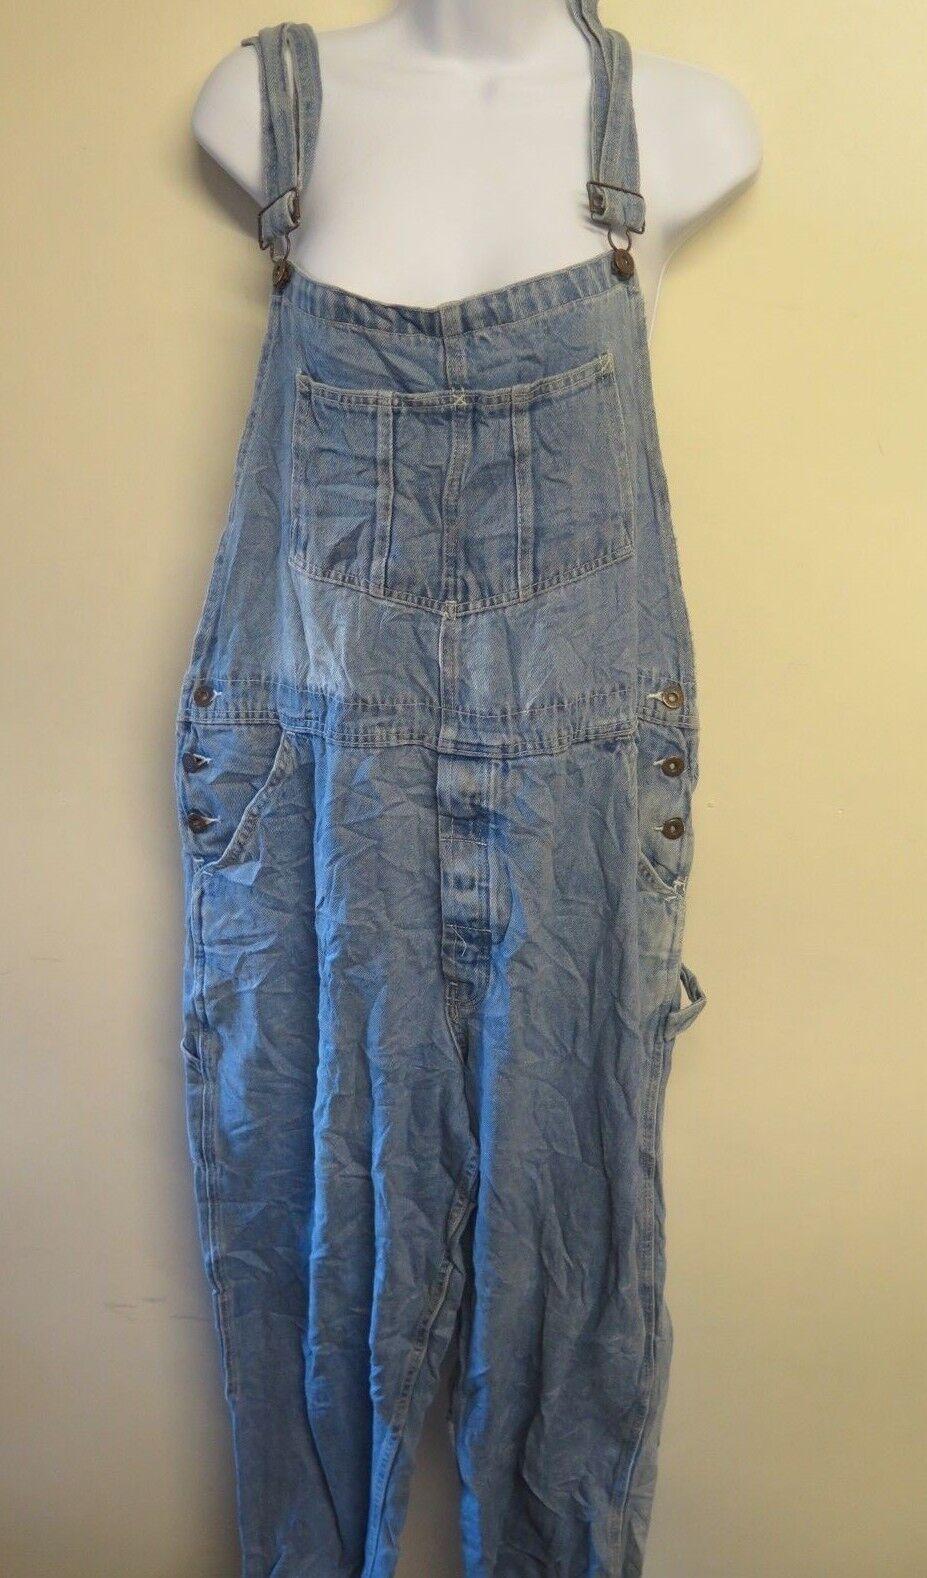 Vintage Denim Oversize Dungarees Overalls Combinaison UK Taille XL UK Combinaison 16/18 5bf6f2